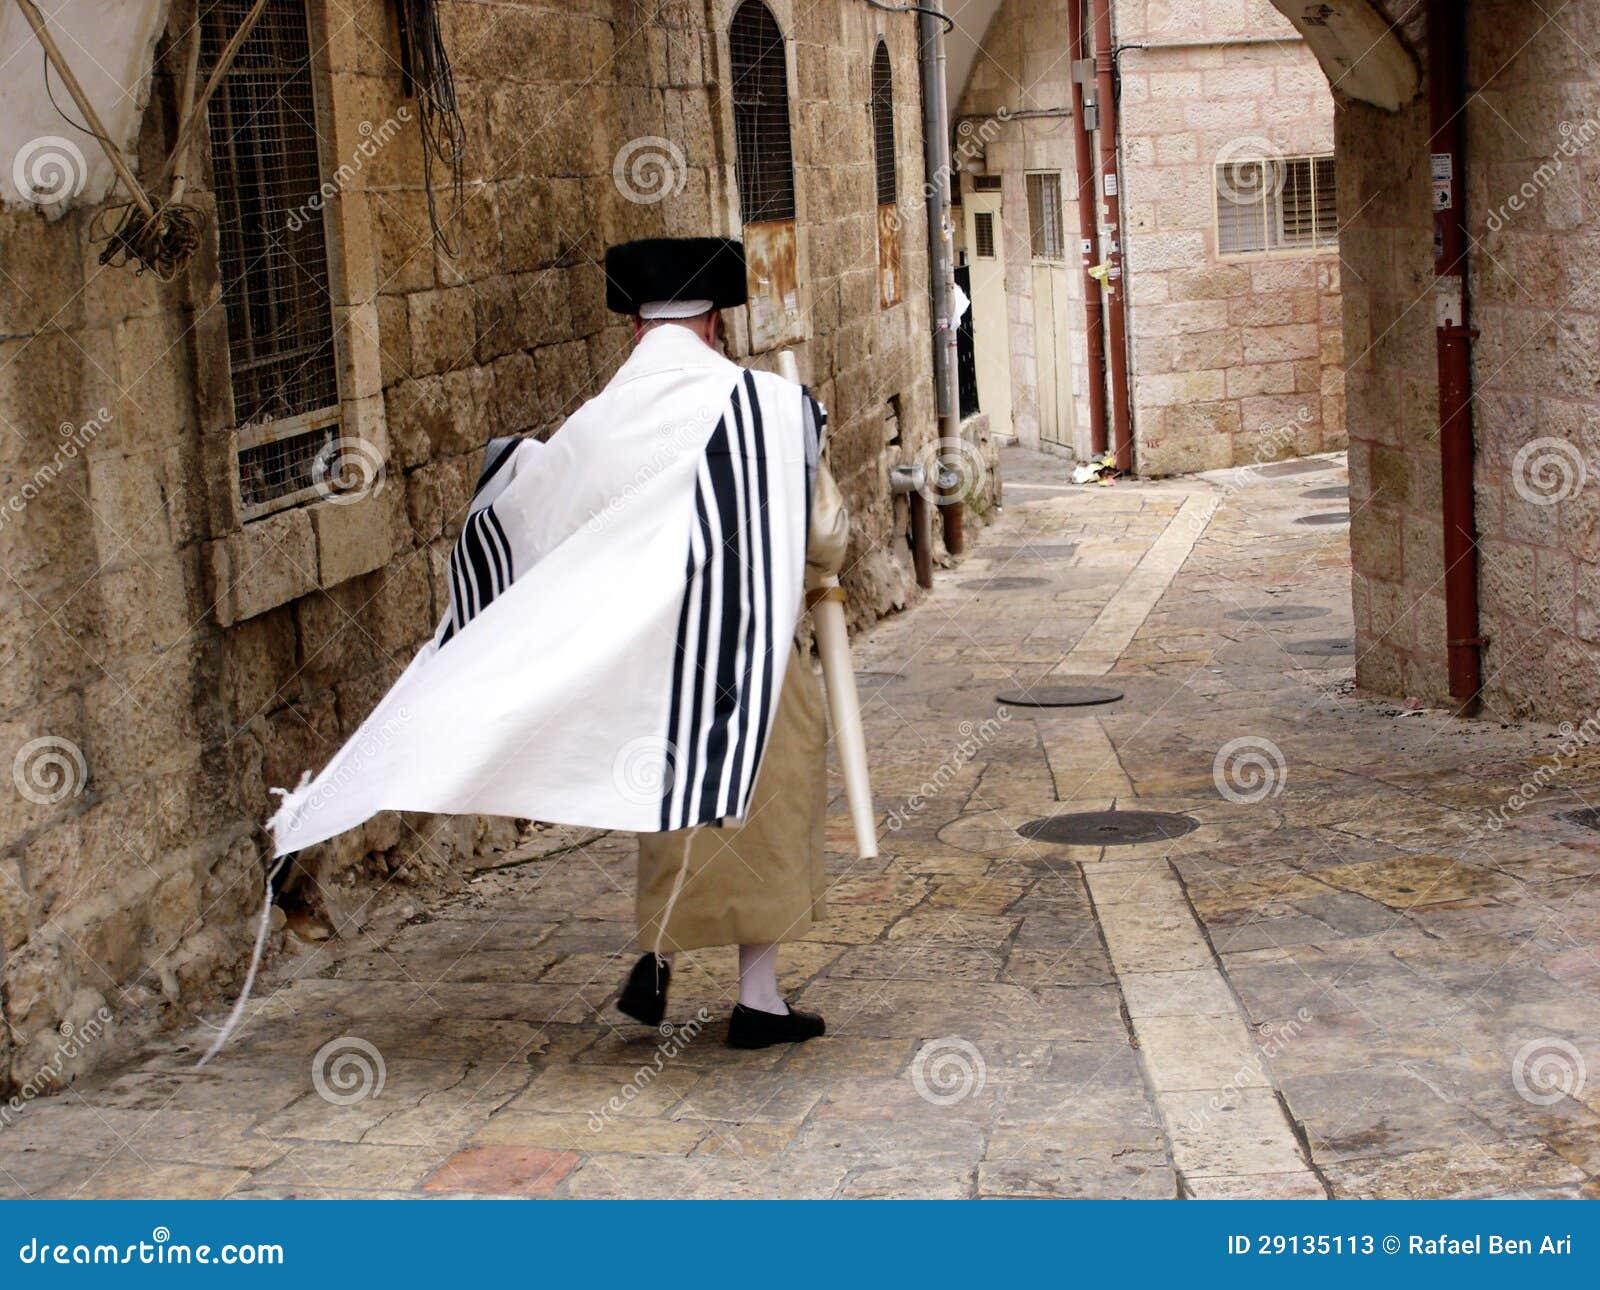 Vizinhança do Mea Shearim em Jerusalem Israel.